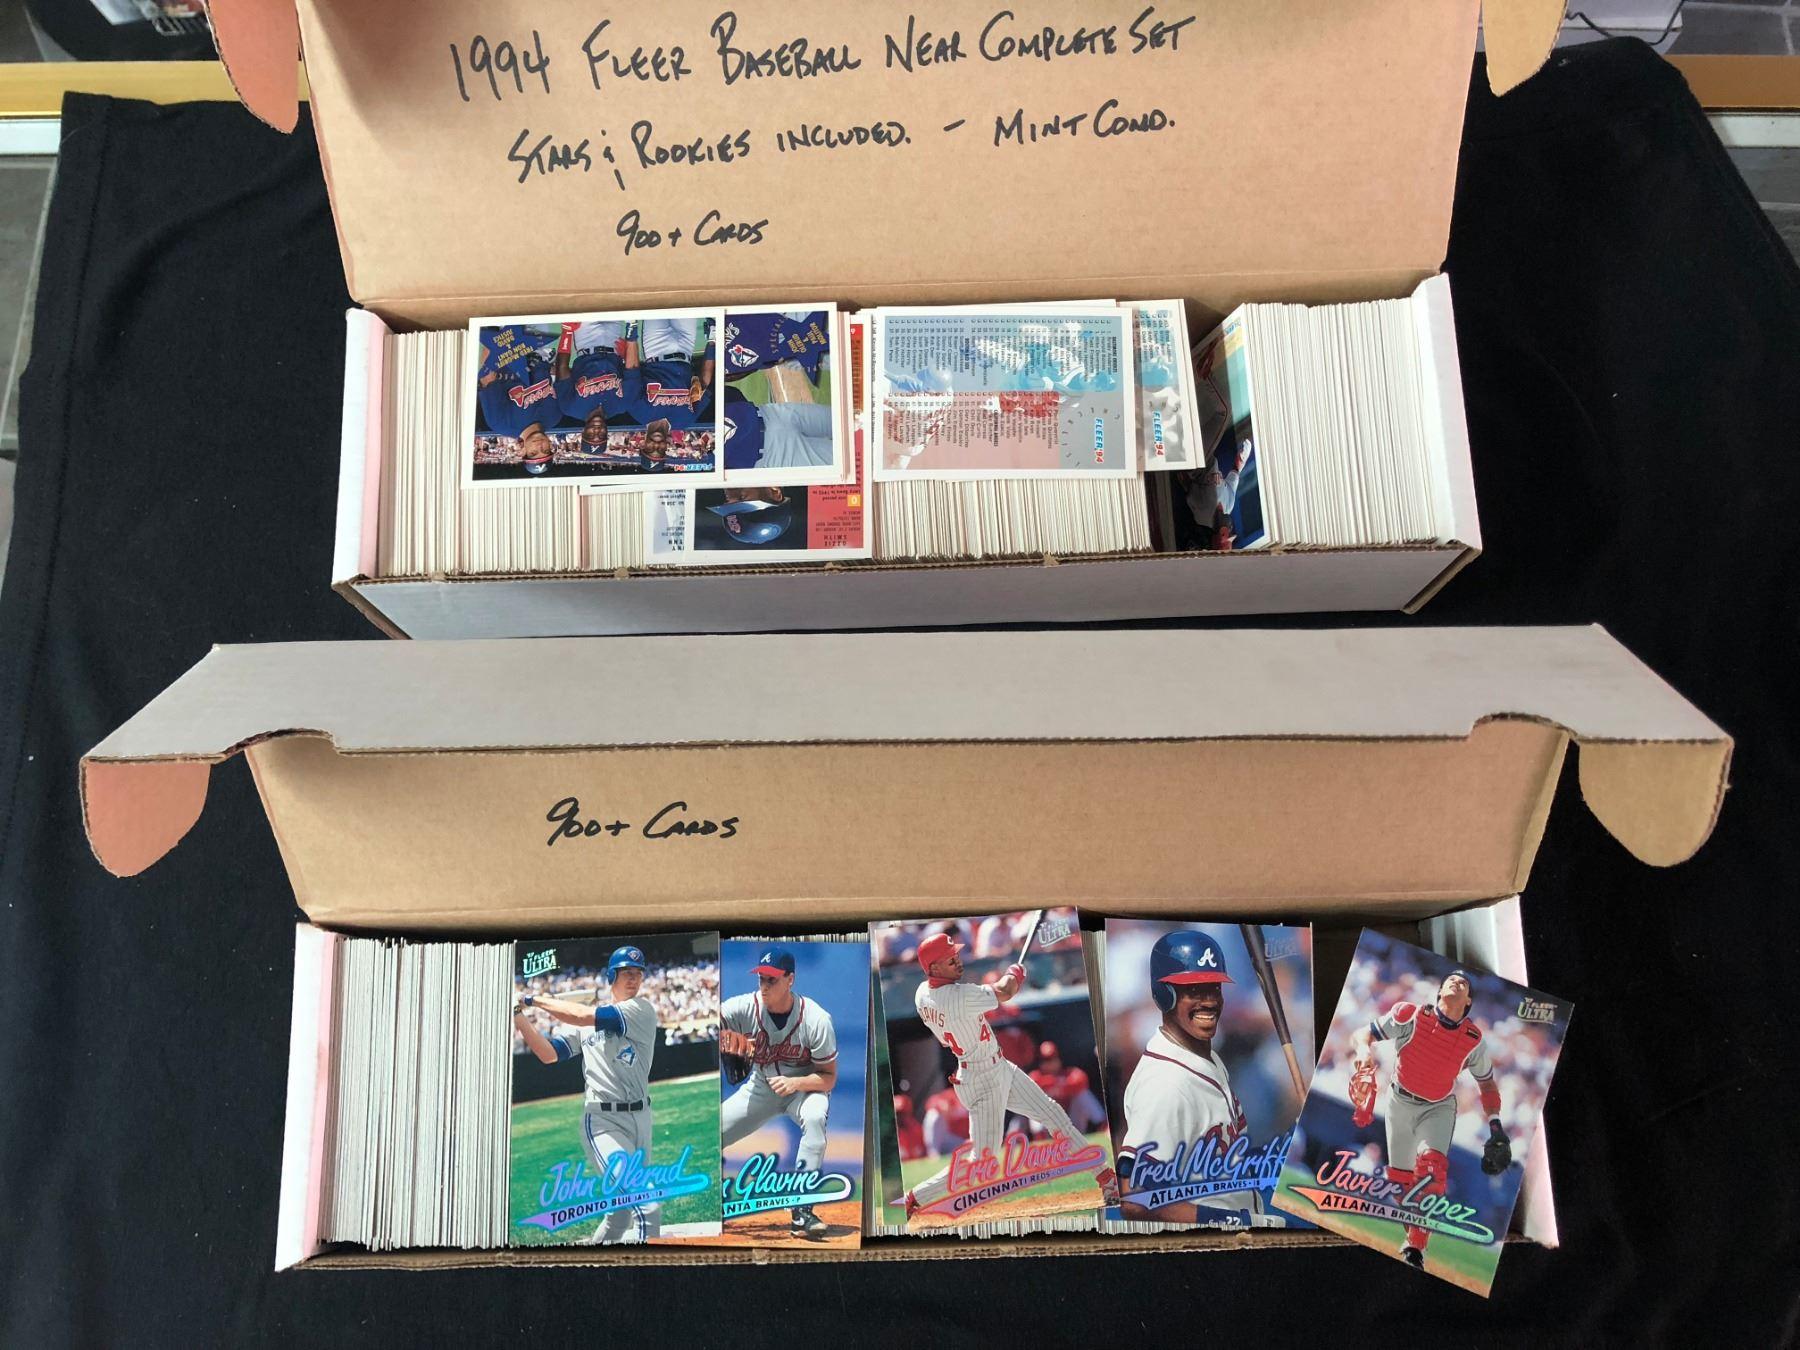 Baseball Card Lot 1800 Cards 1994 Fleer Baseball Near Complete Set Includes Stars Rookies